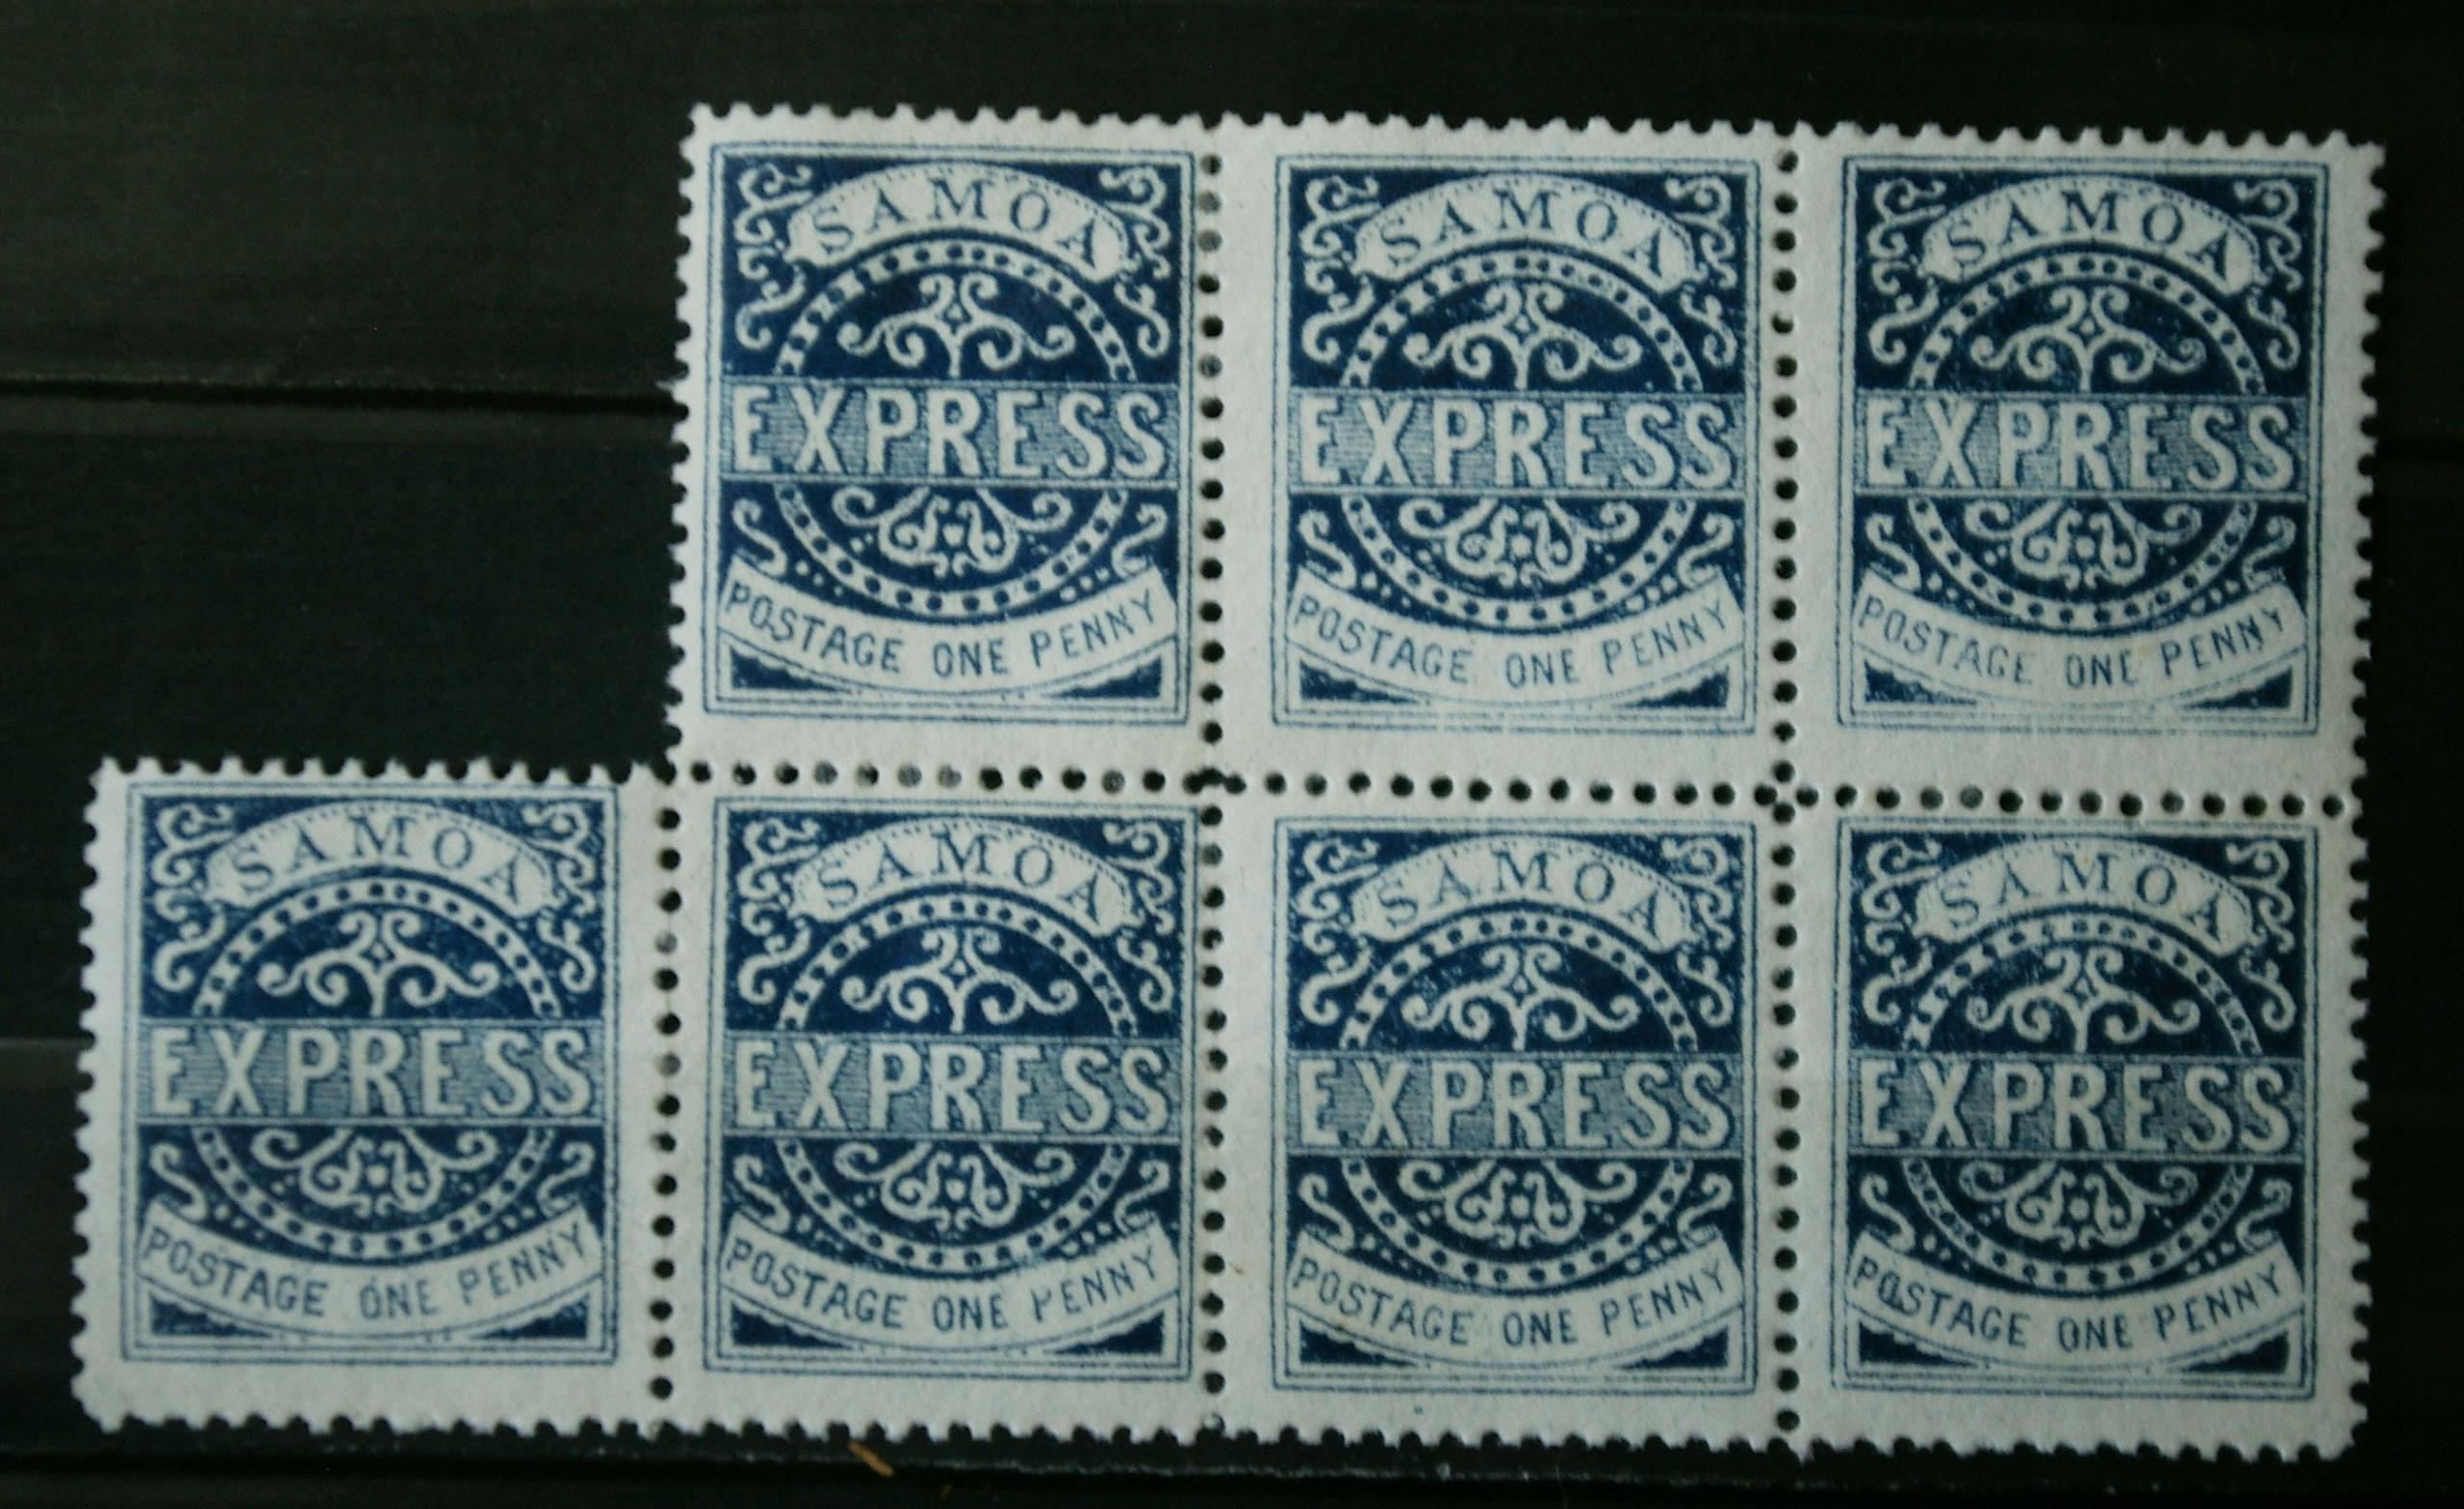 Samoa Express arkusik 1 penny